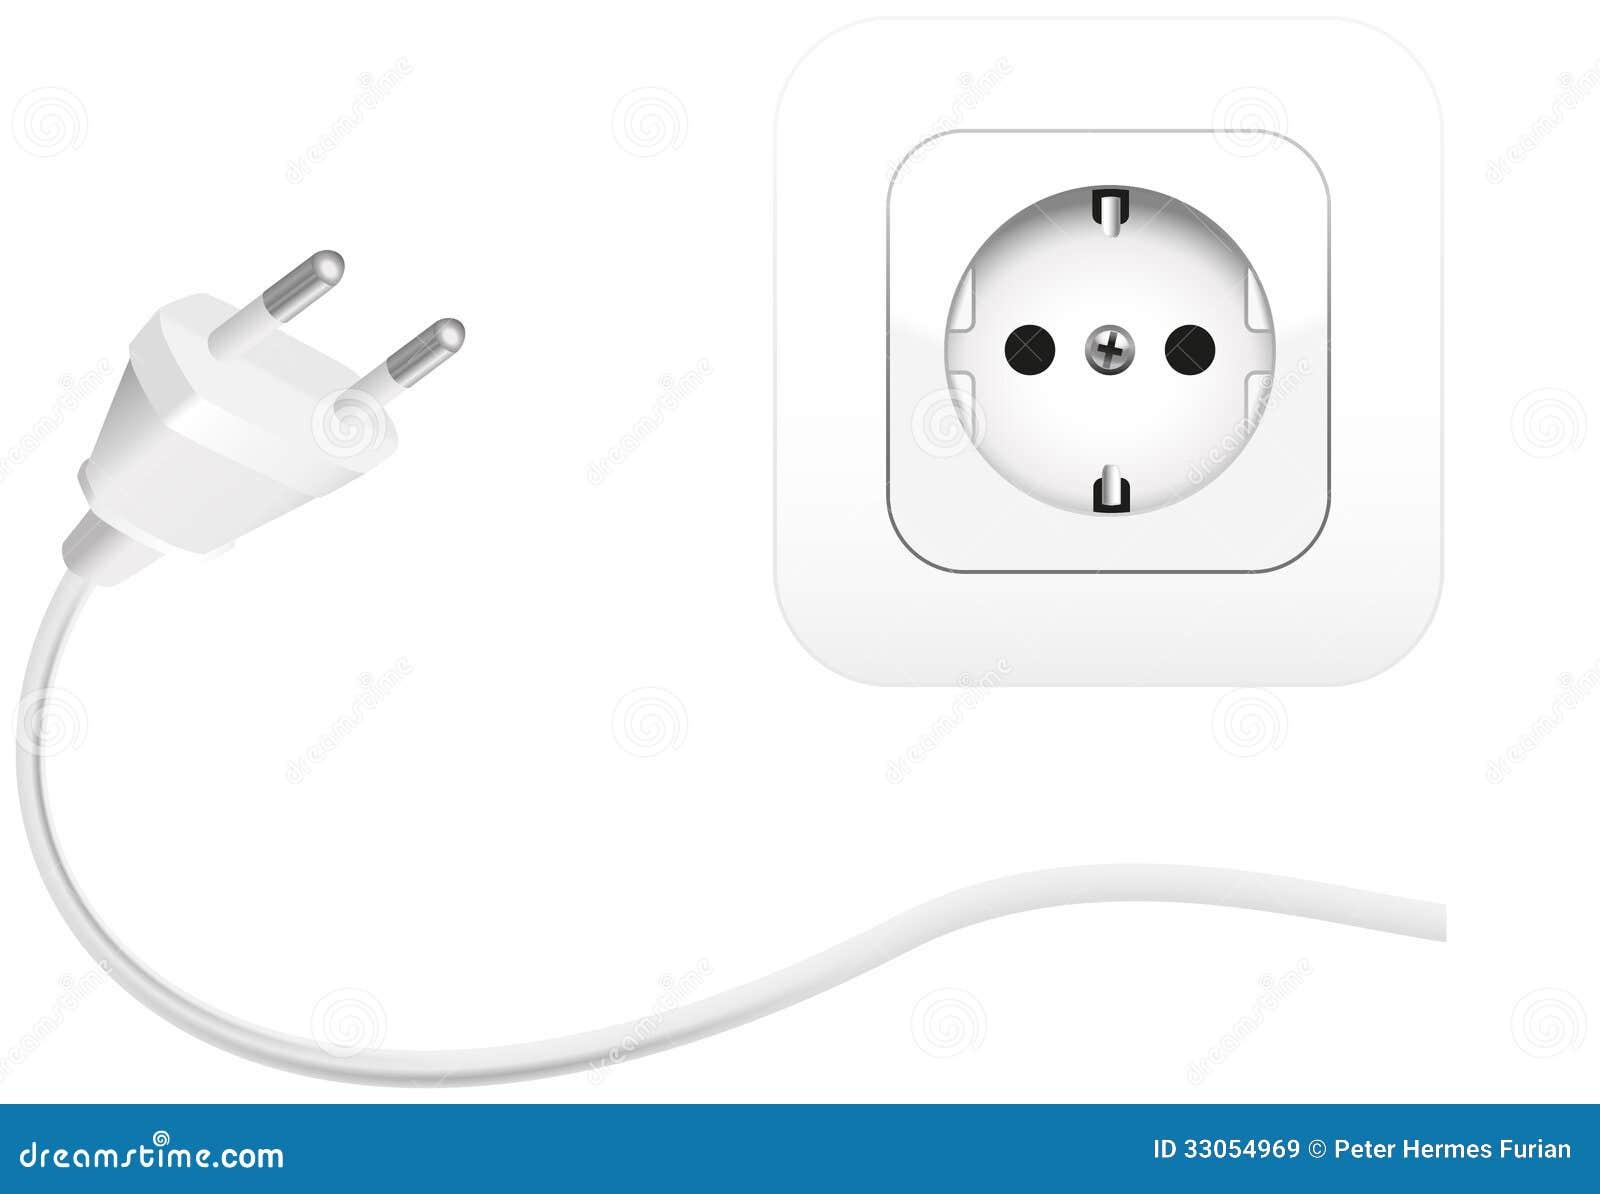 Plug An Socket Royalty Free Stock Images Image 33054969